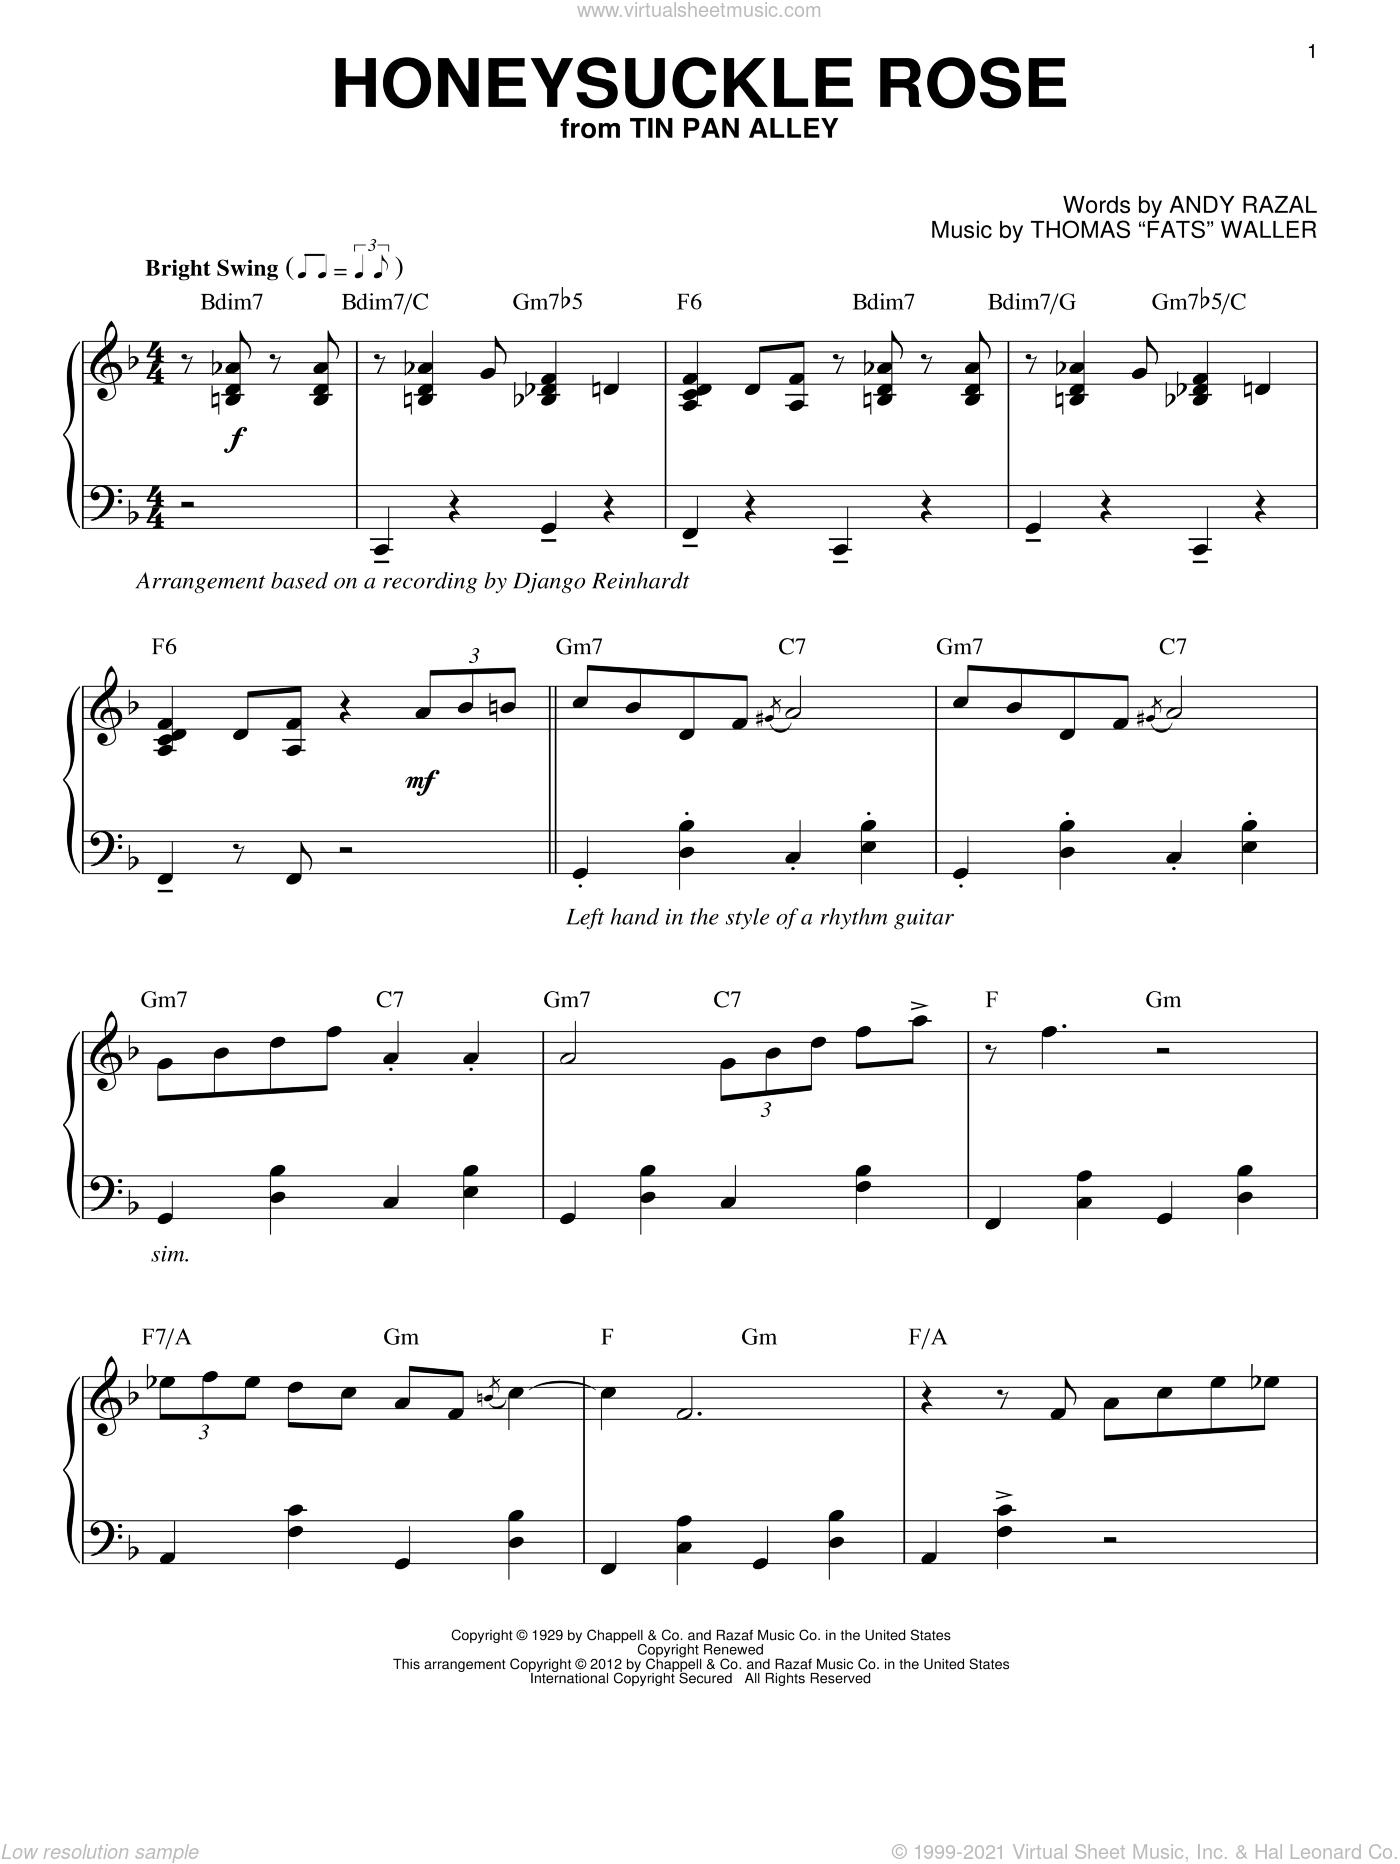 Honeysuckle Rose sheet music for piano solo by Django Reinhardt, intermediate skill level